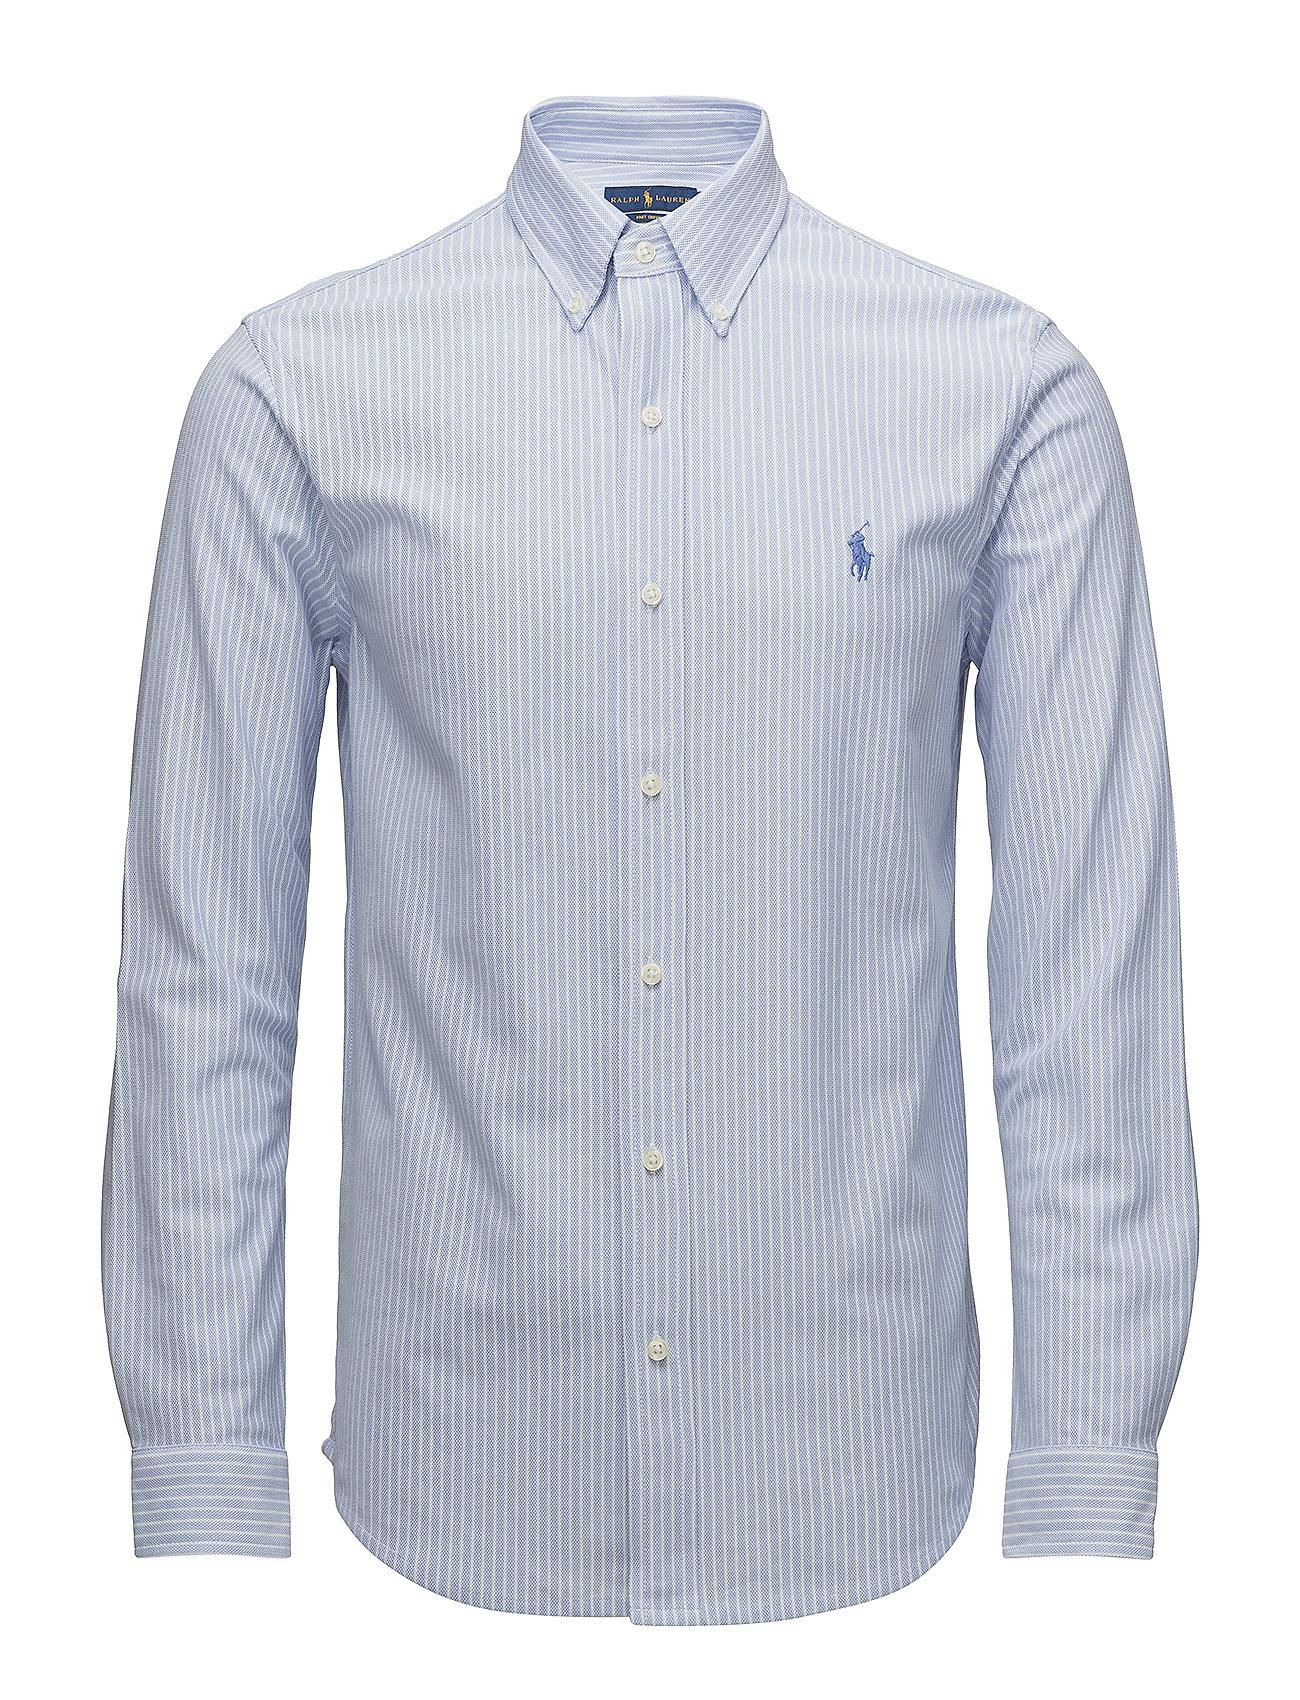 Classic Fit Knit Oxford Shirt Dress Shirt Blue 115